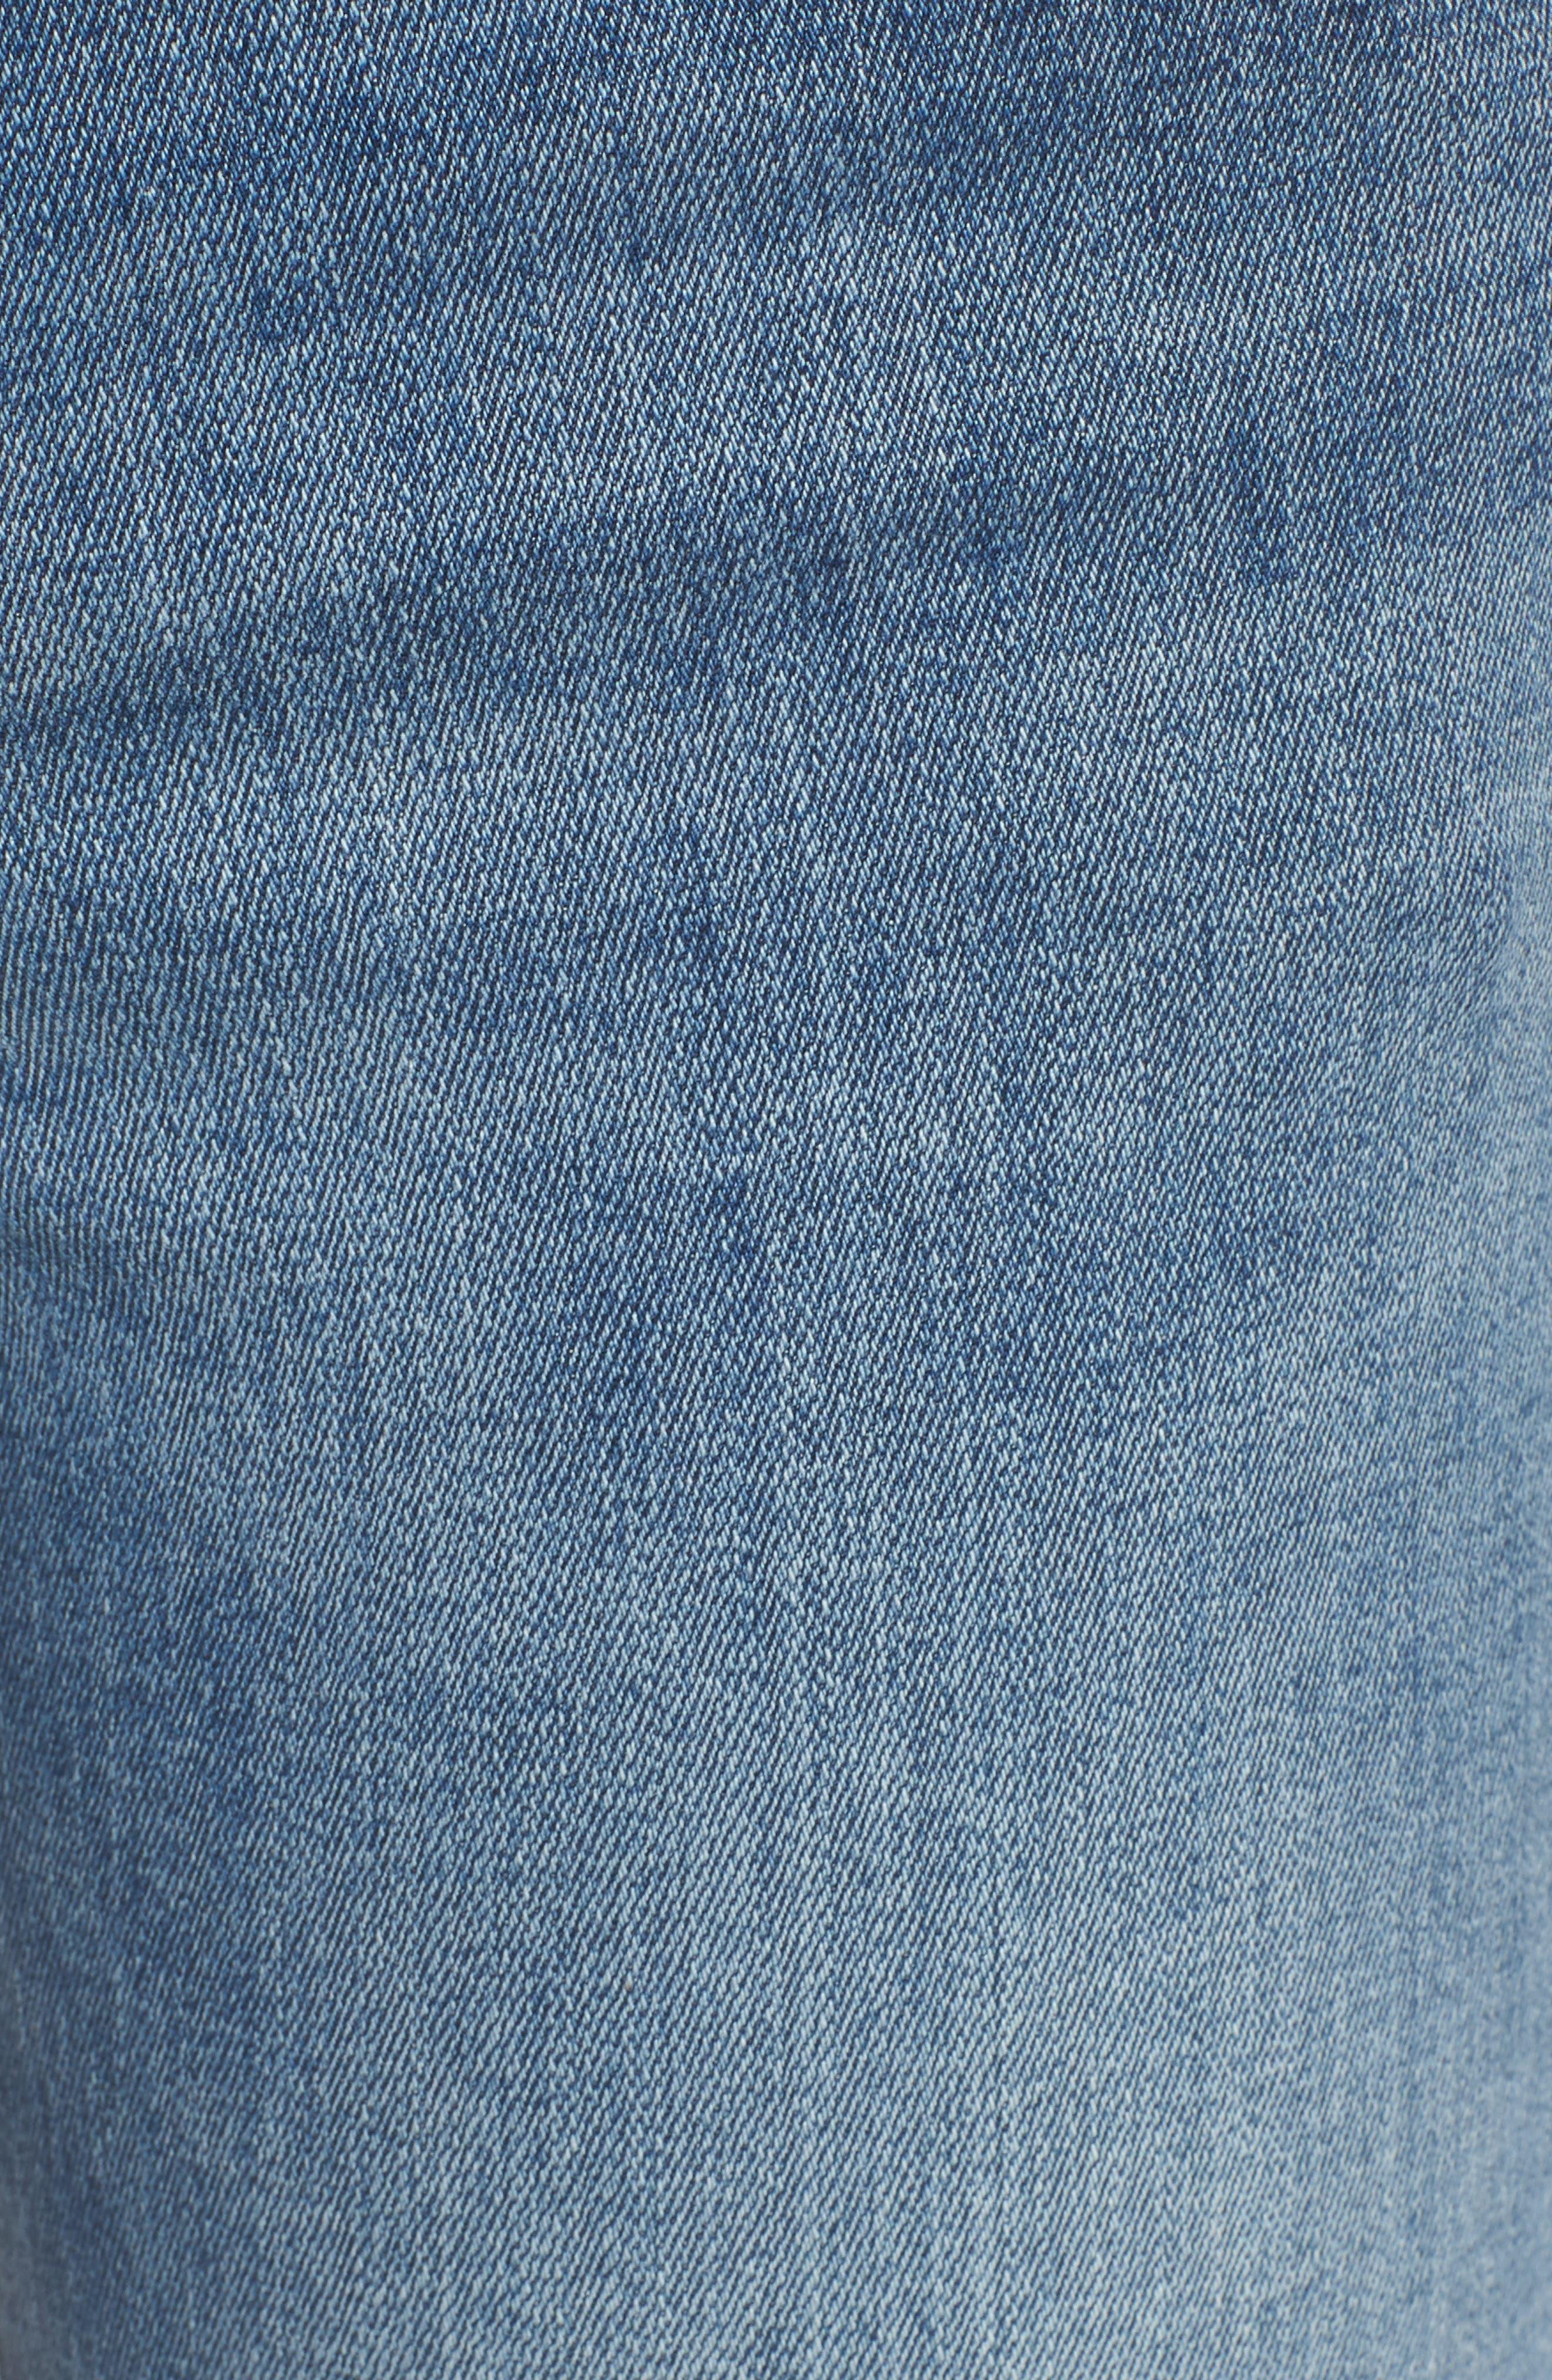 Florence Instasculpt Skinny Jeans,                             Alternate thumbnail 6, color,                             Delano